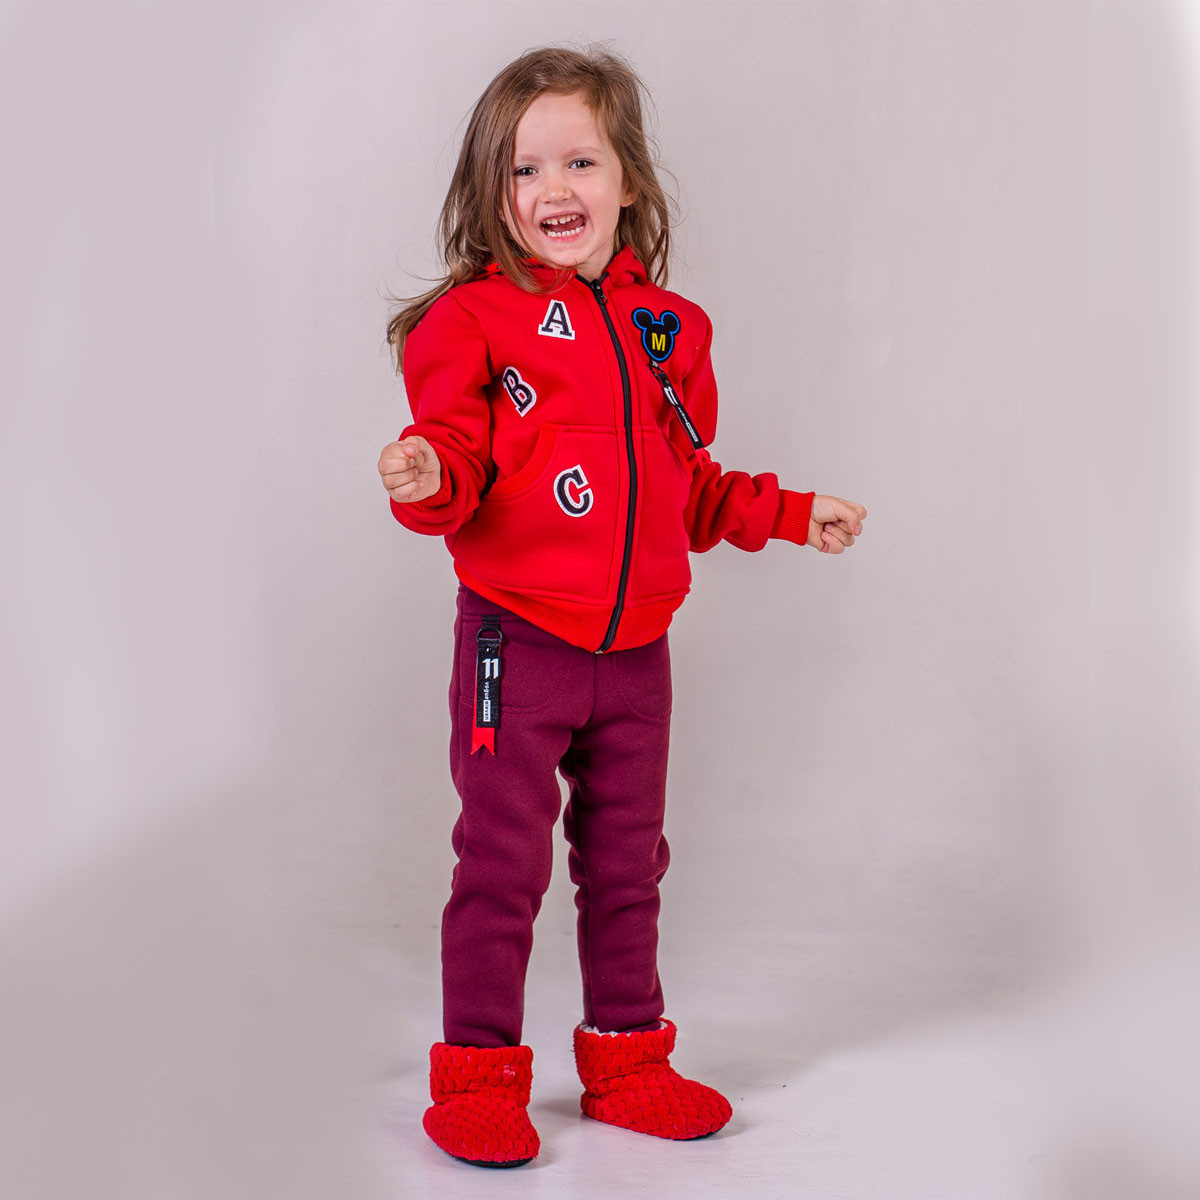 Кофта детская утепленная р.104,110,116,122 SmileTime Minny, красная